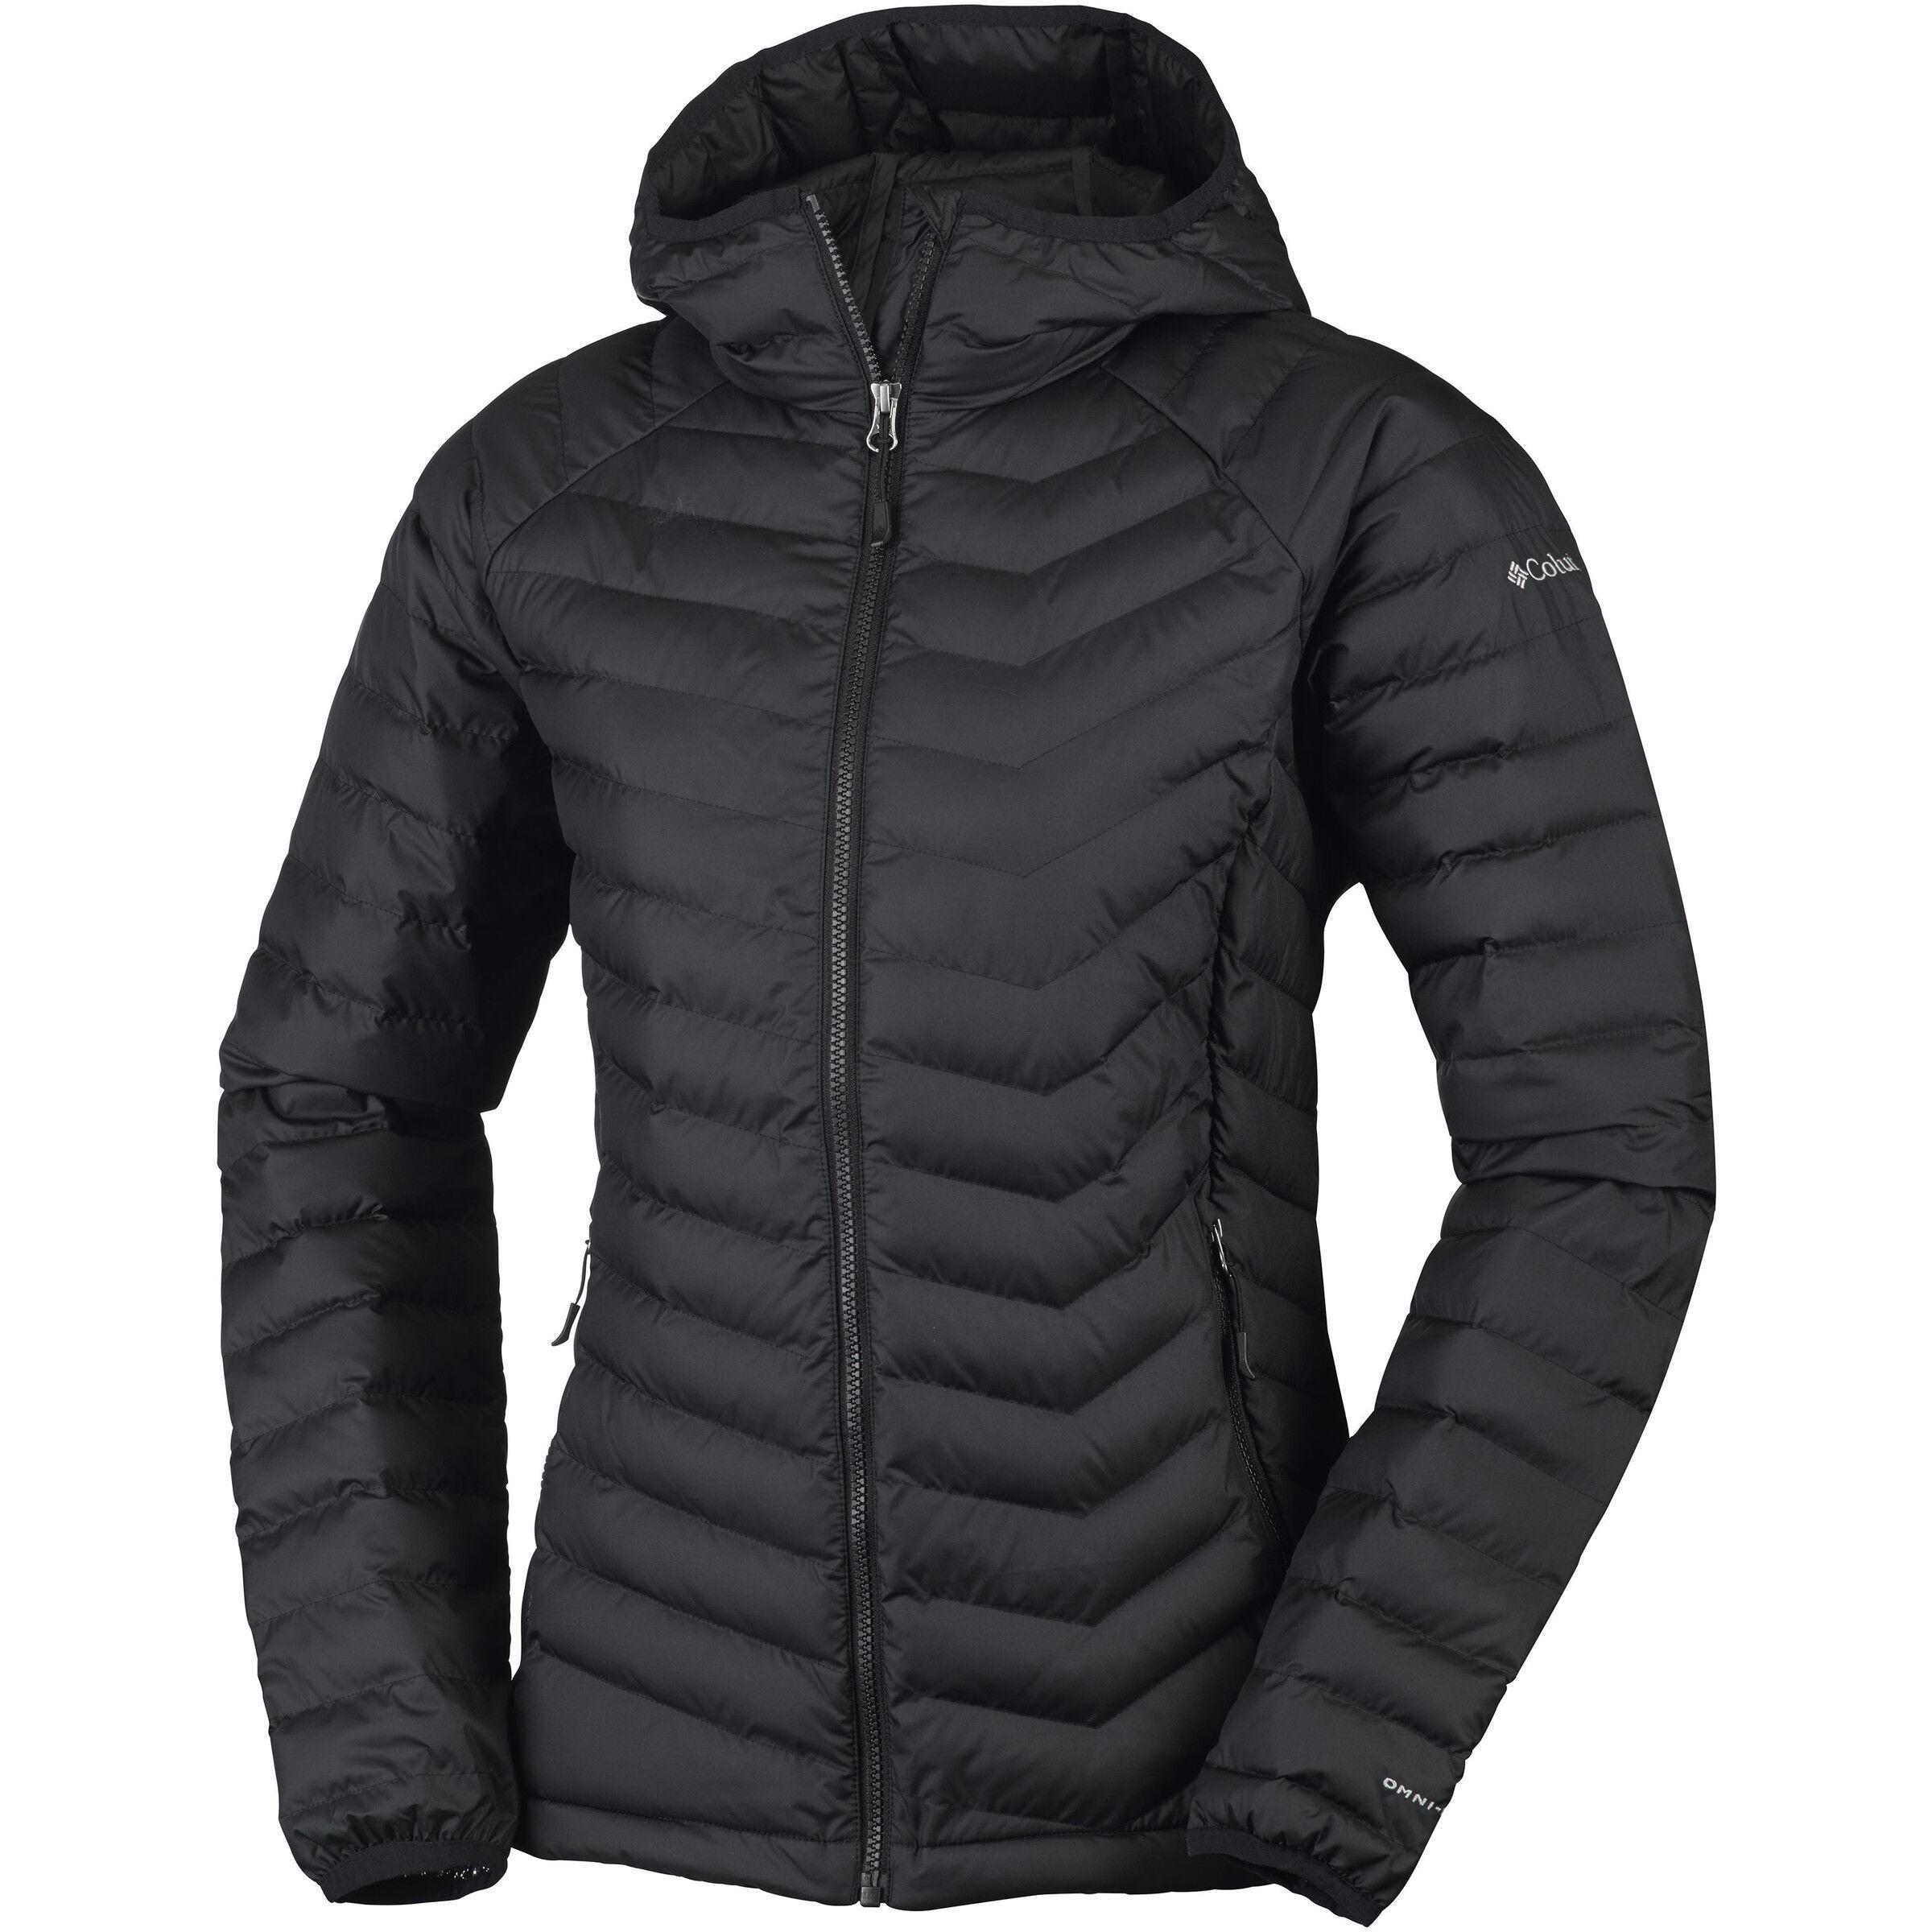 Columbia Powder Lite Hooded Jacke schwarz (Damen) ab € 49,99